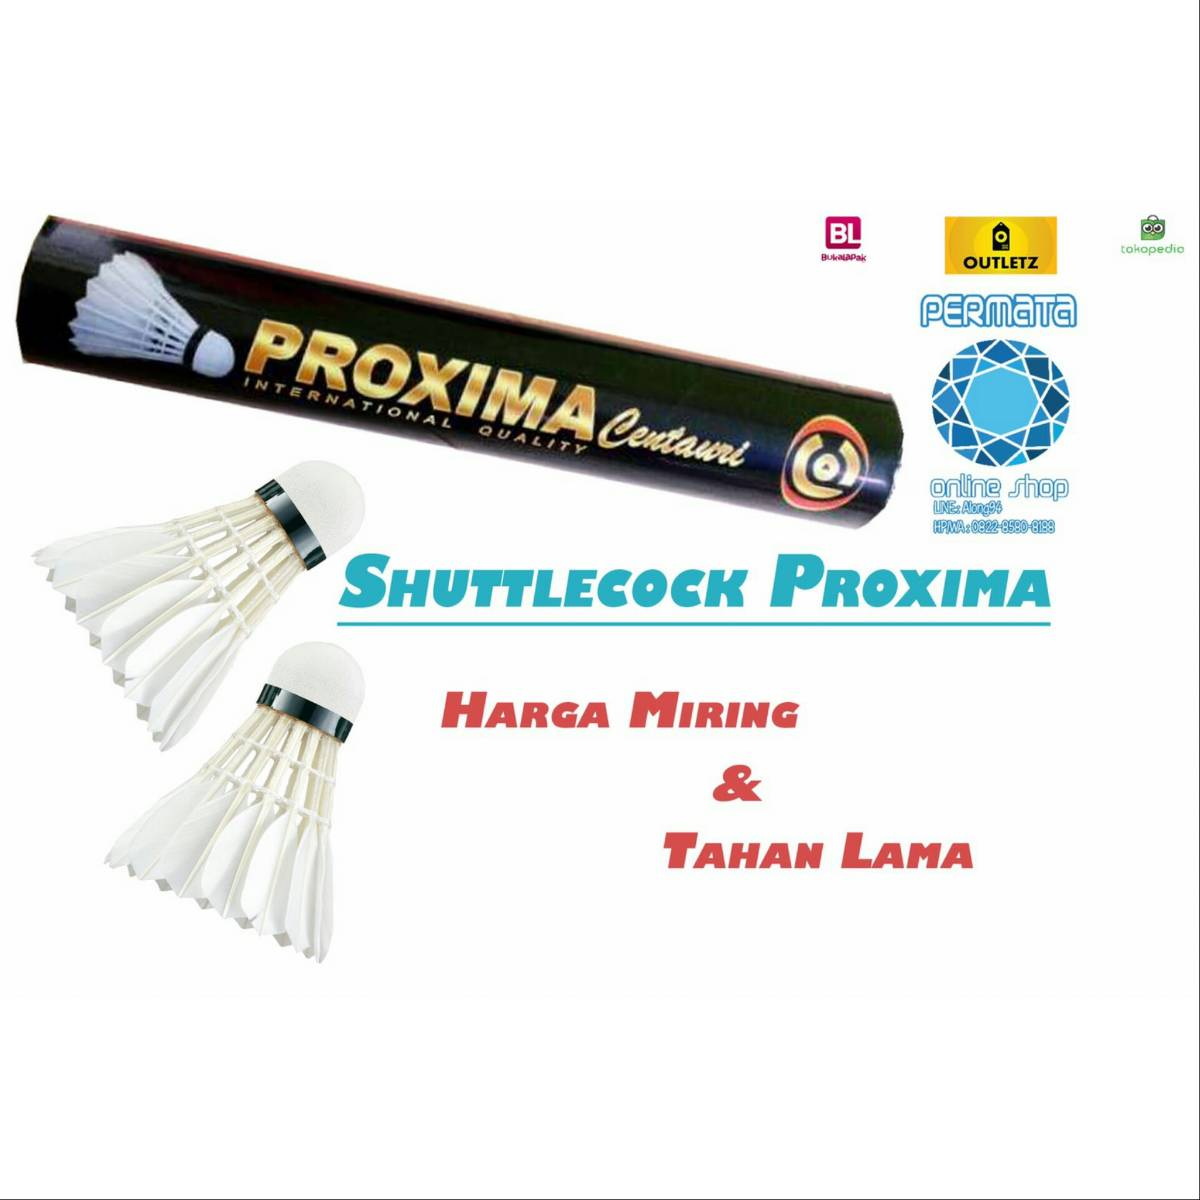 Shuttlecock Proxima